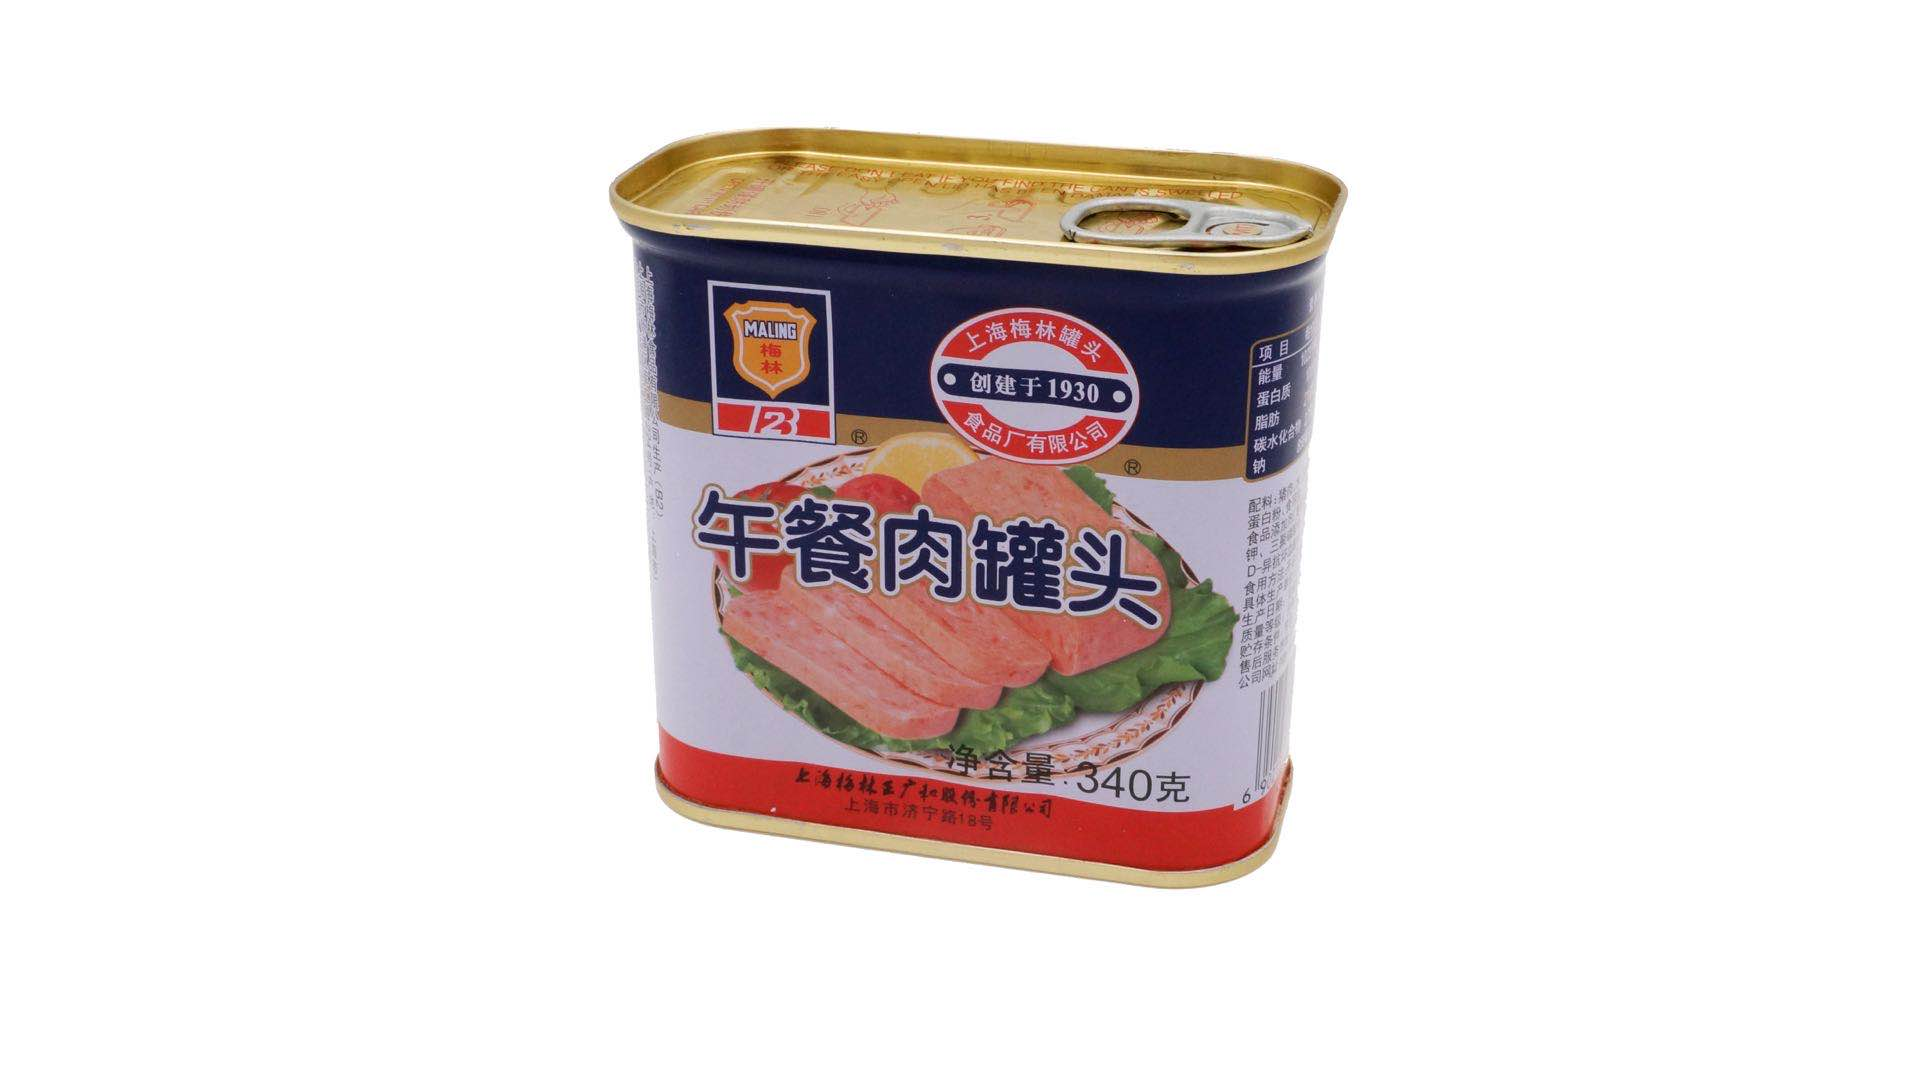 maling上海梅林午餐肉罐头火锅猪肉熟 198g*3/340g*3